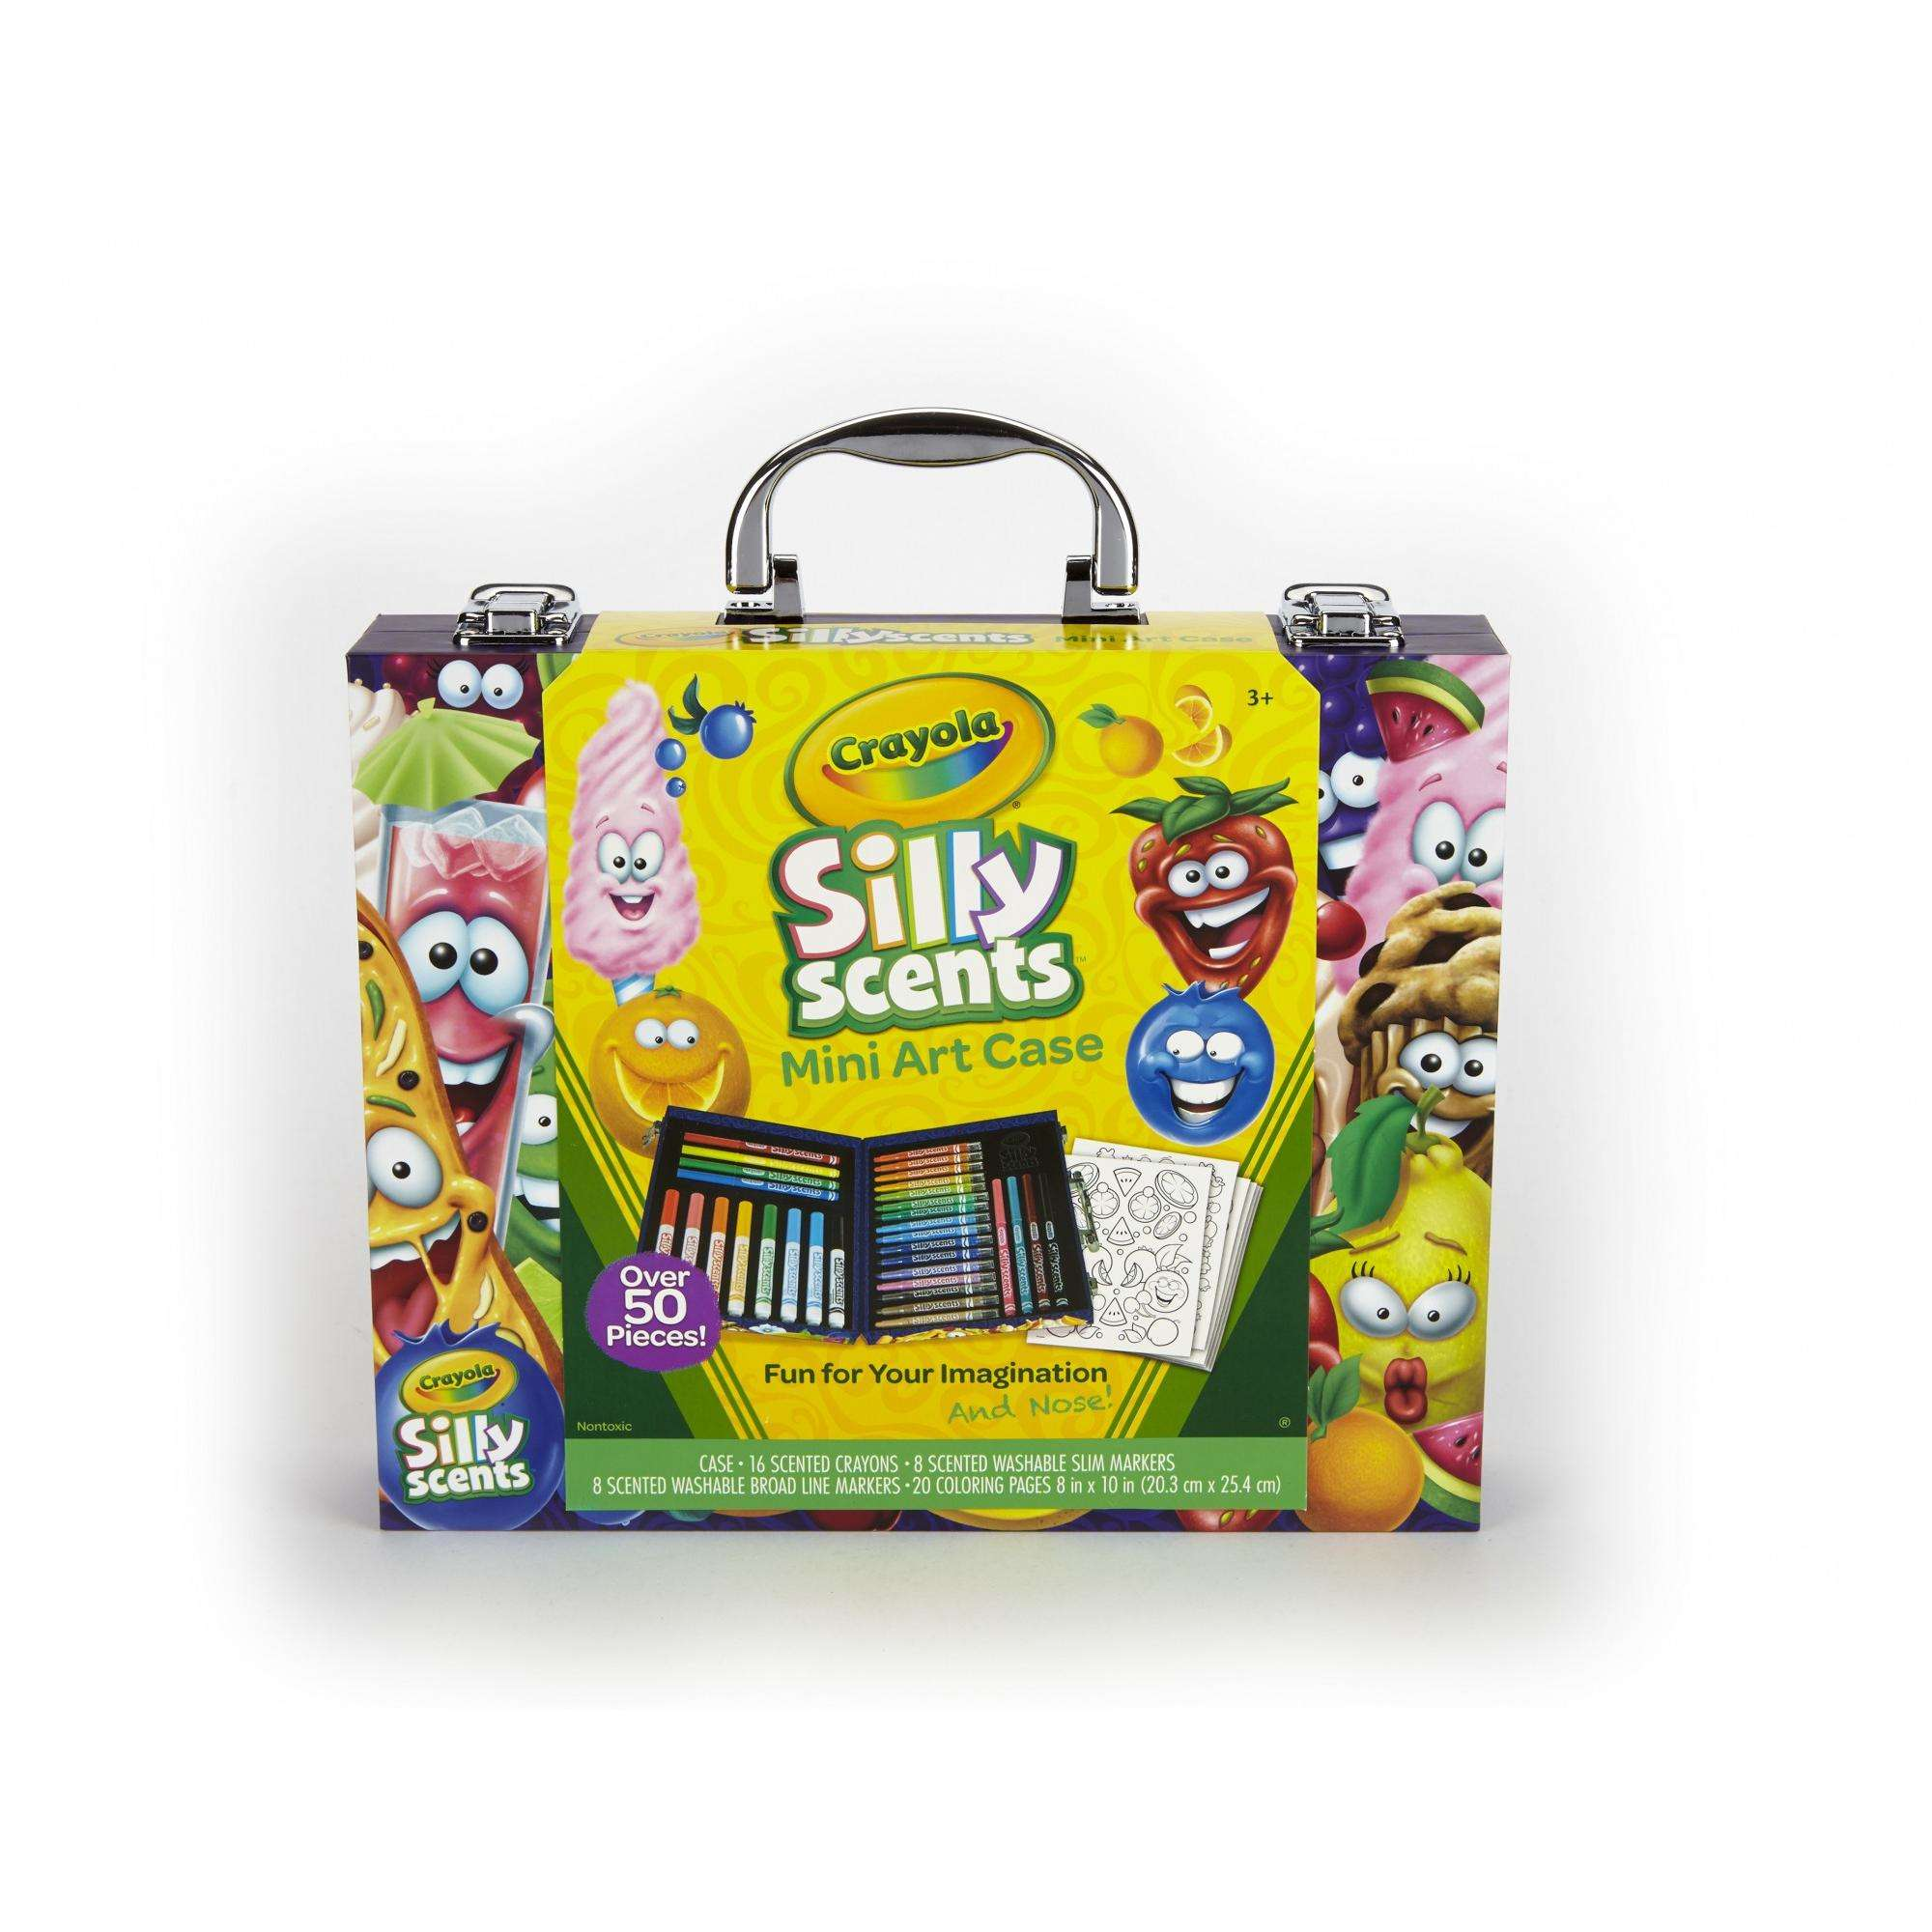 Crayola Silly Scents Mini Inspiration 52 Piece Art Case Kit ...